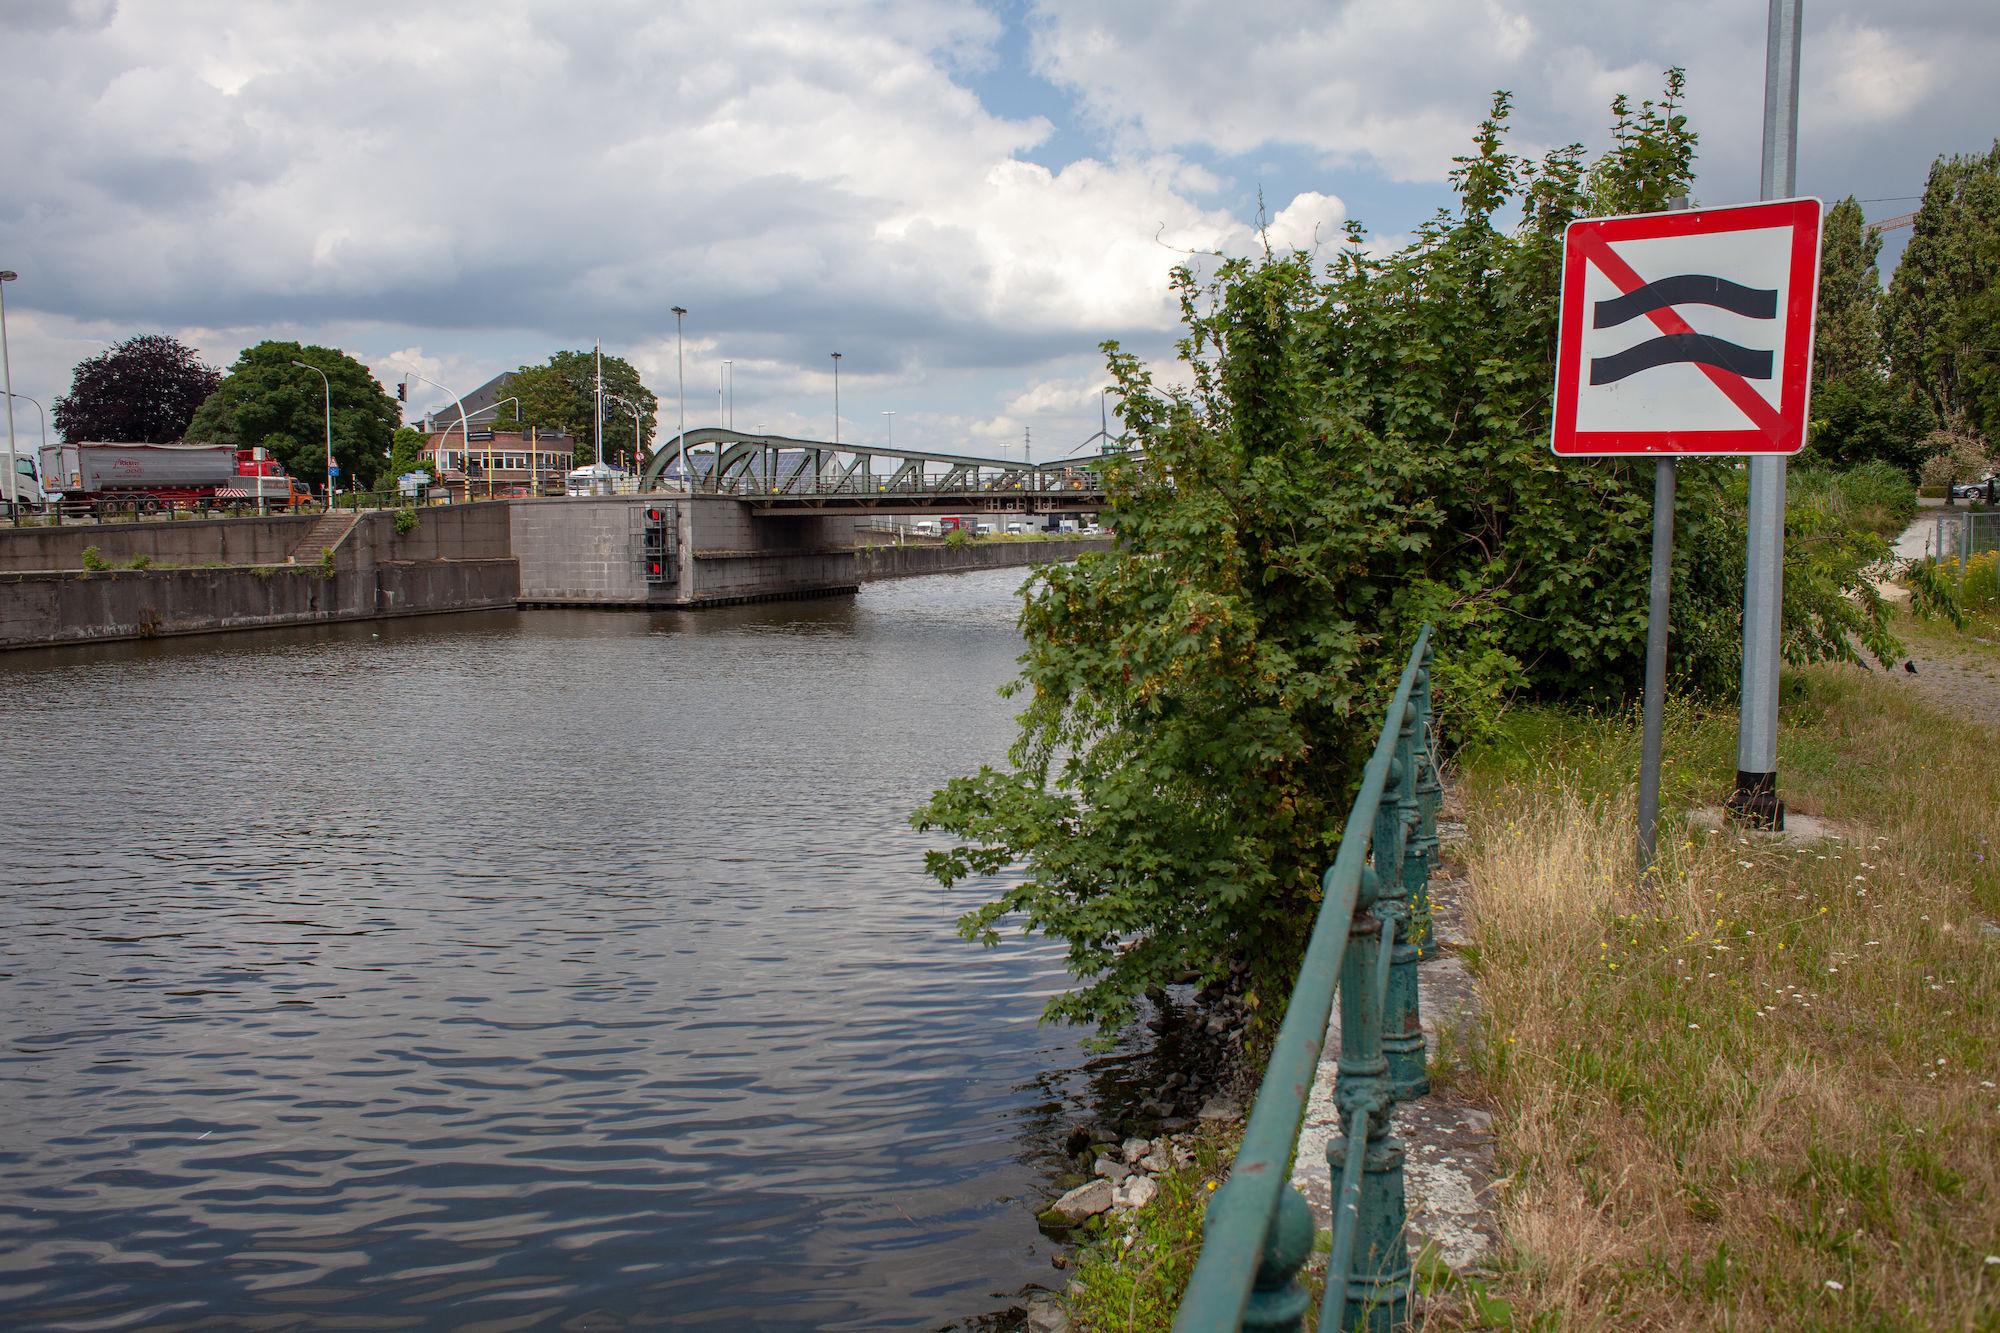 2019-07-02 Muide Meulestede prospectie Wannes_stadsvernieuwing_IMG_0371-2.jpg